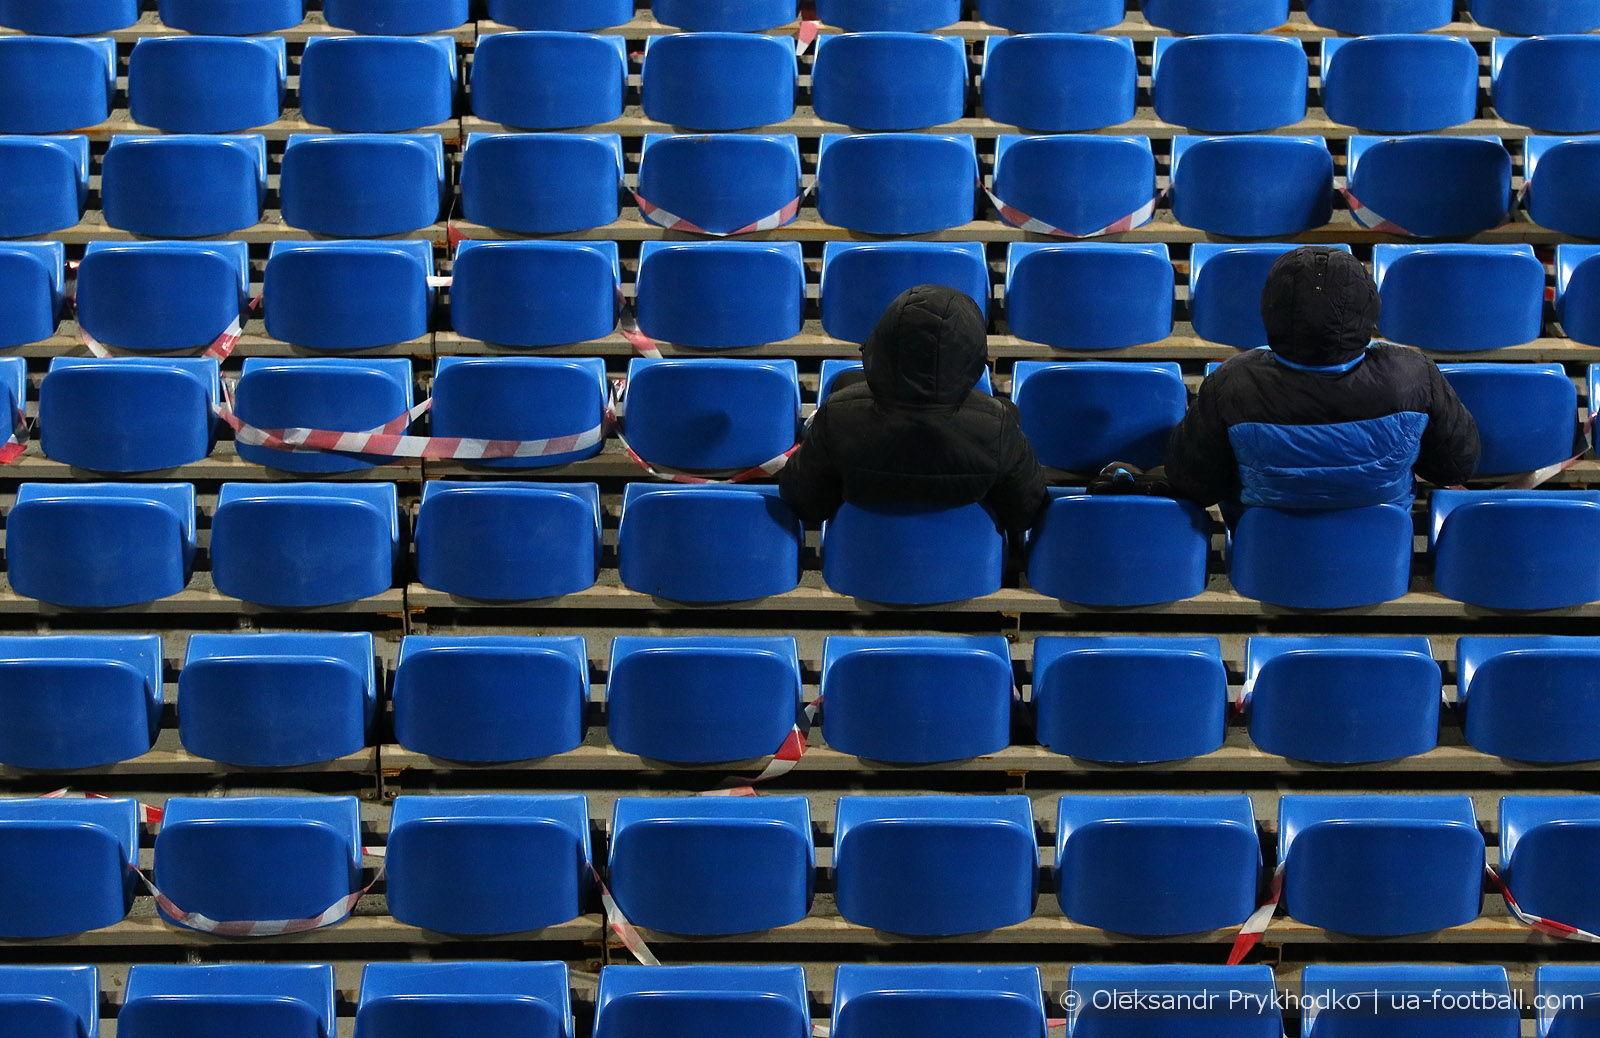 Рядовое дерби с незаурядным скандалом. ФОТО репортаж с матча Олимпик - Шахтер - фото 14